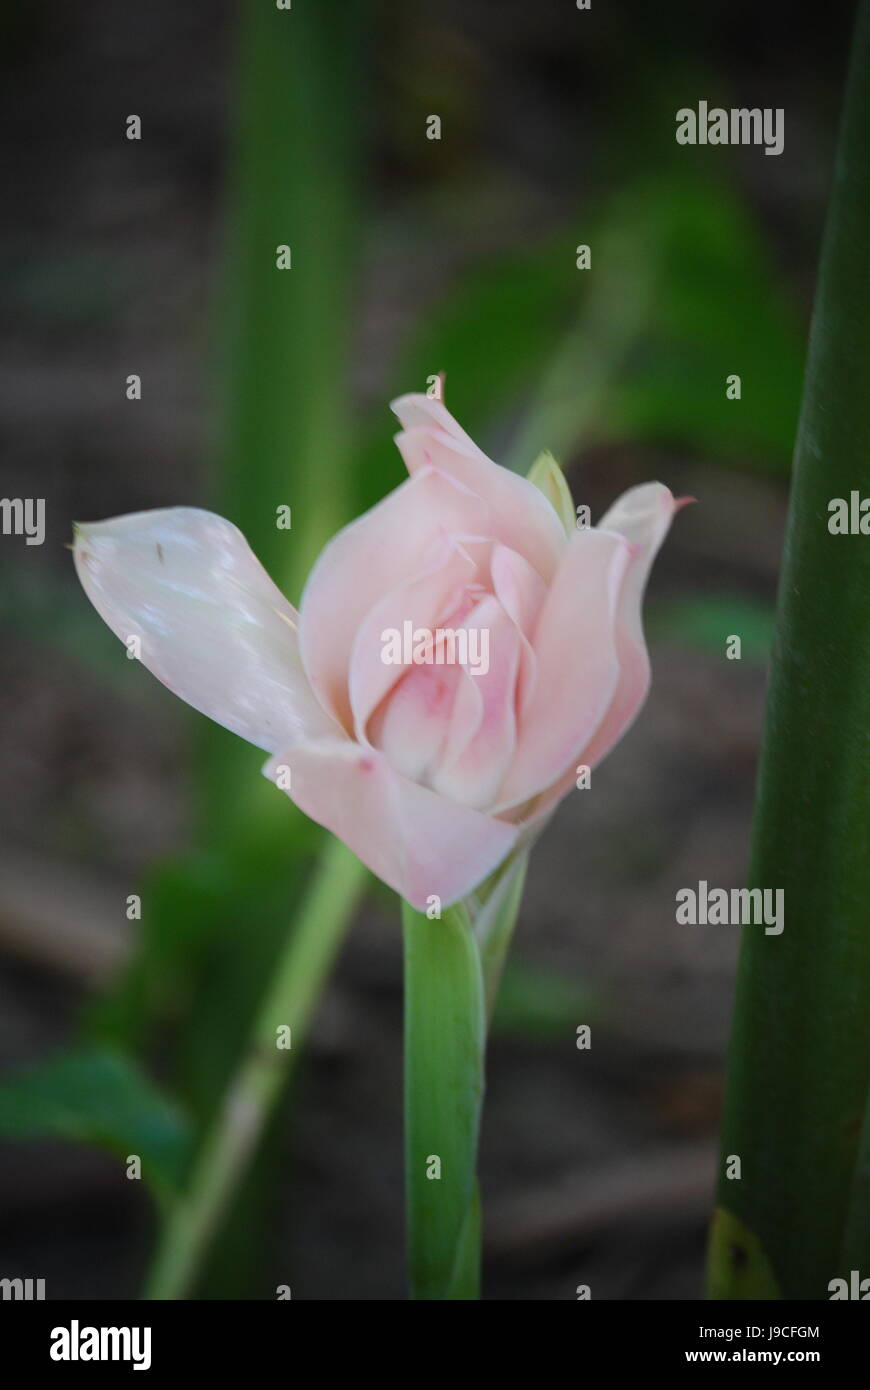 Bud Pink Ginger Flower Stock Photo 143490500 Alamy